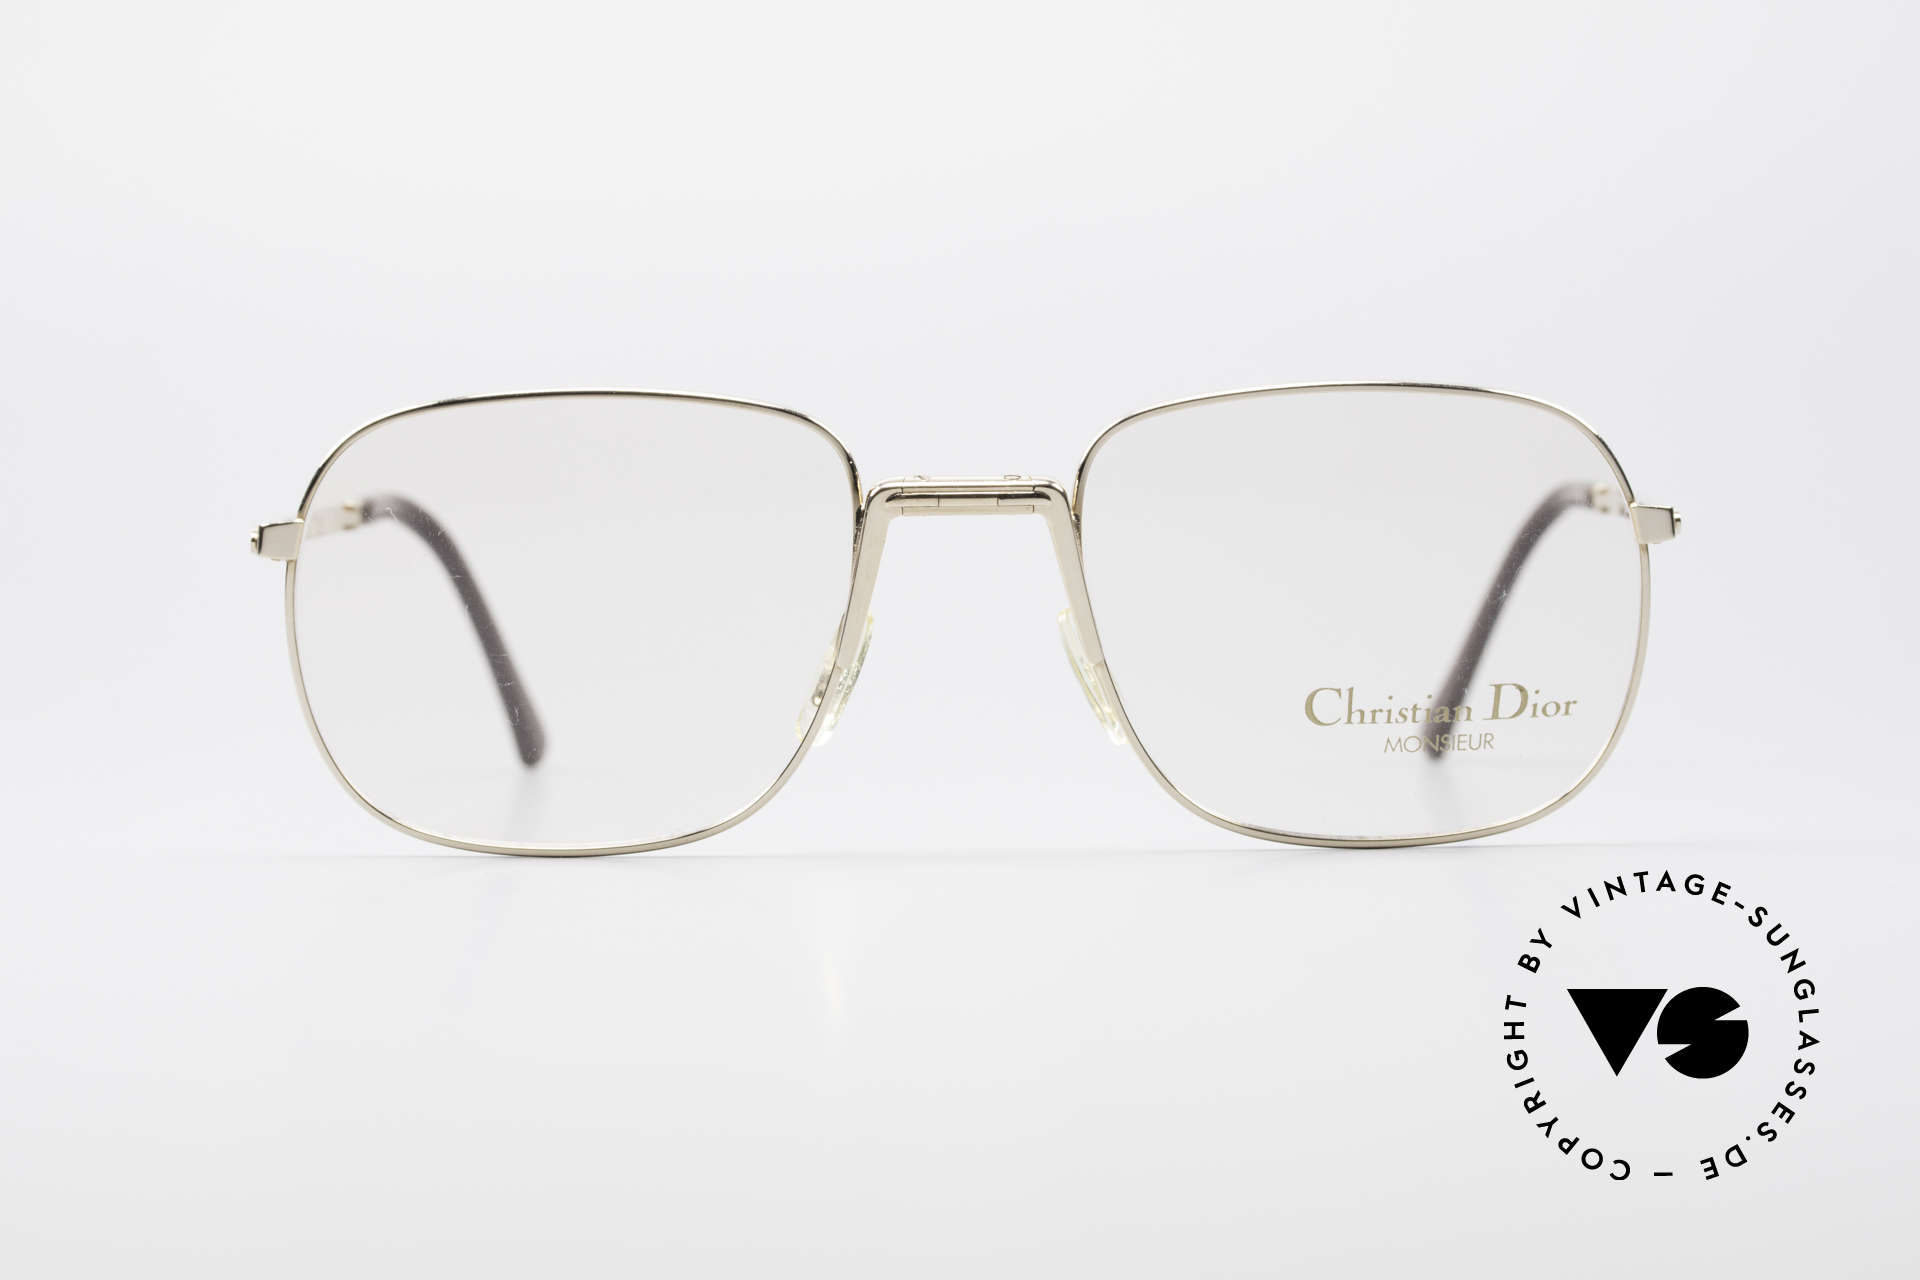 Christian Dior 2288 Monsieur Folding Eyeglasses, practical folding model in great quality (gold-plated), Made for Men